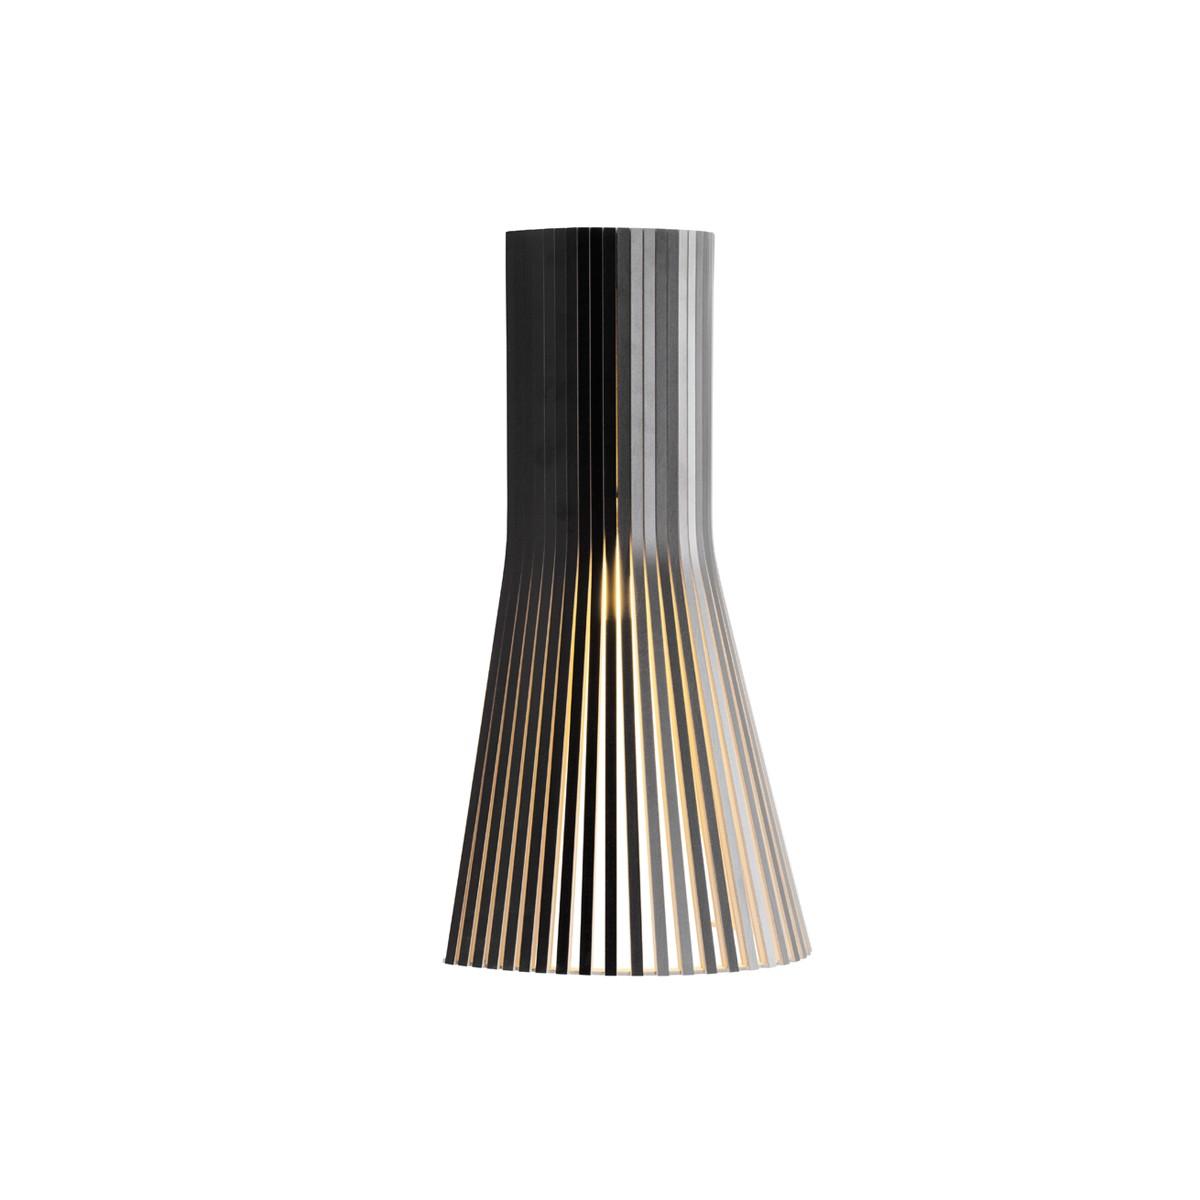 Secto Design Secto 4231 Wandleuchte, schwarz laminiert